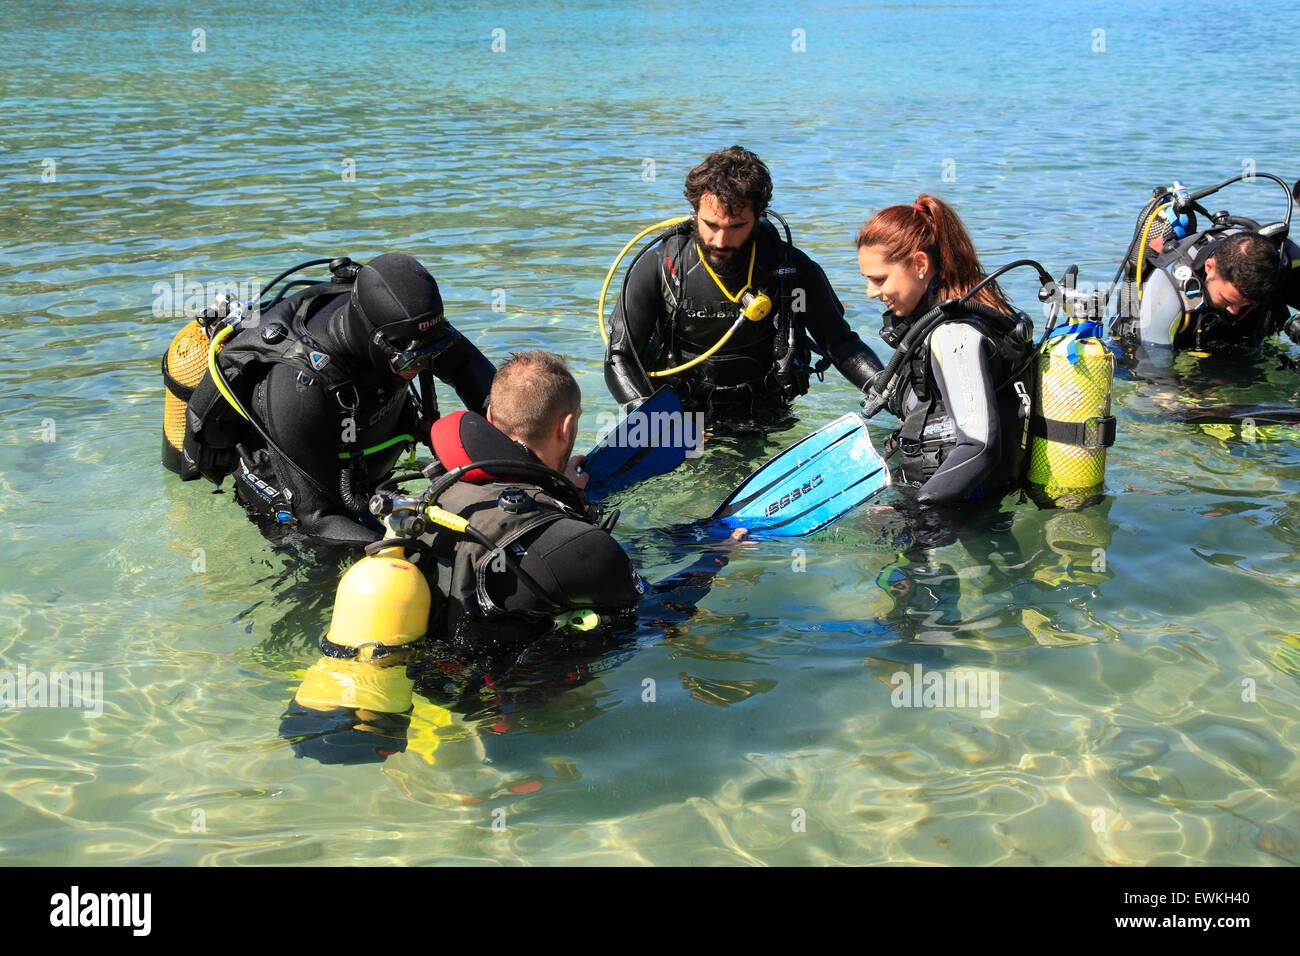 Diving lessons at Aiguablava beach near Begur, Costa Brava, Catalonia, Spain, Europe - Stock Image